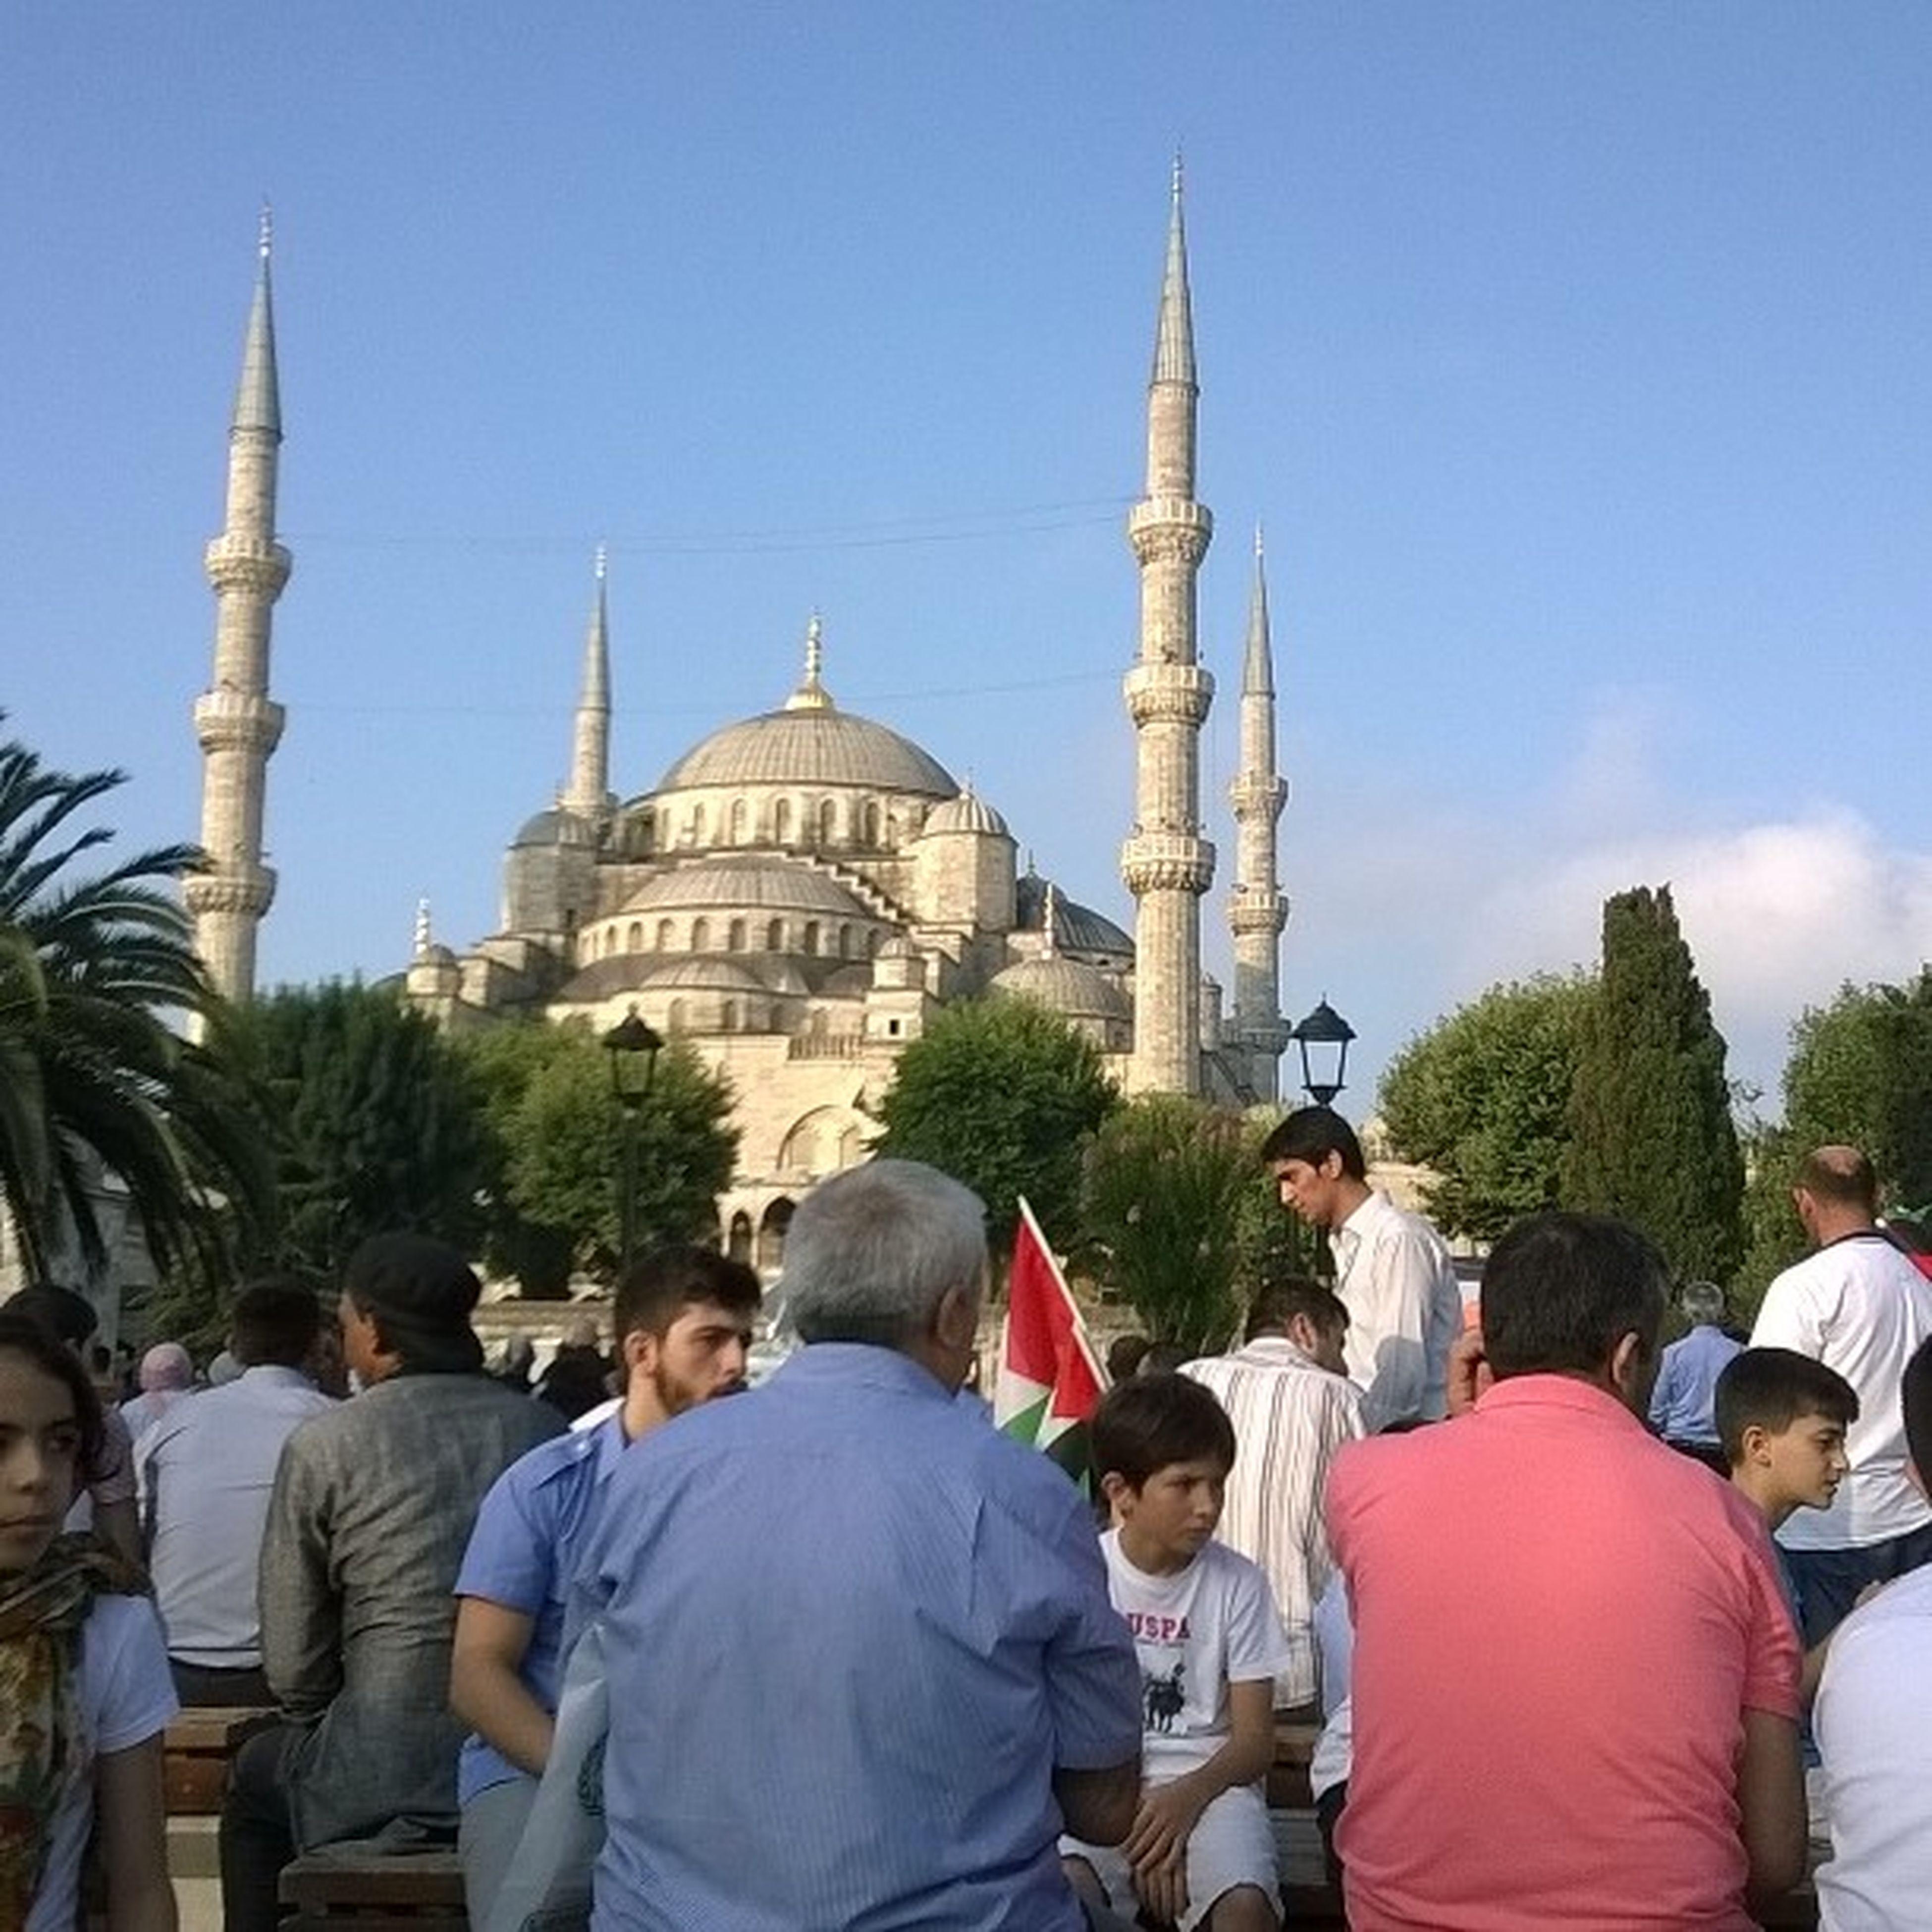 Beraya di Sultanahmet SultanAhmetBlueMosque BerayaDiPerantaun IstanbulBeraya